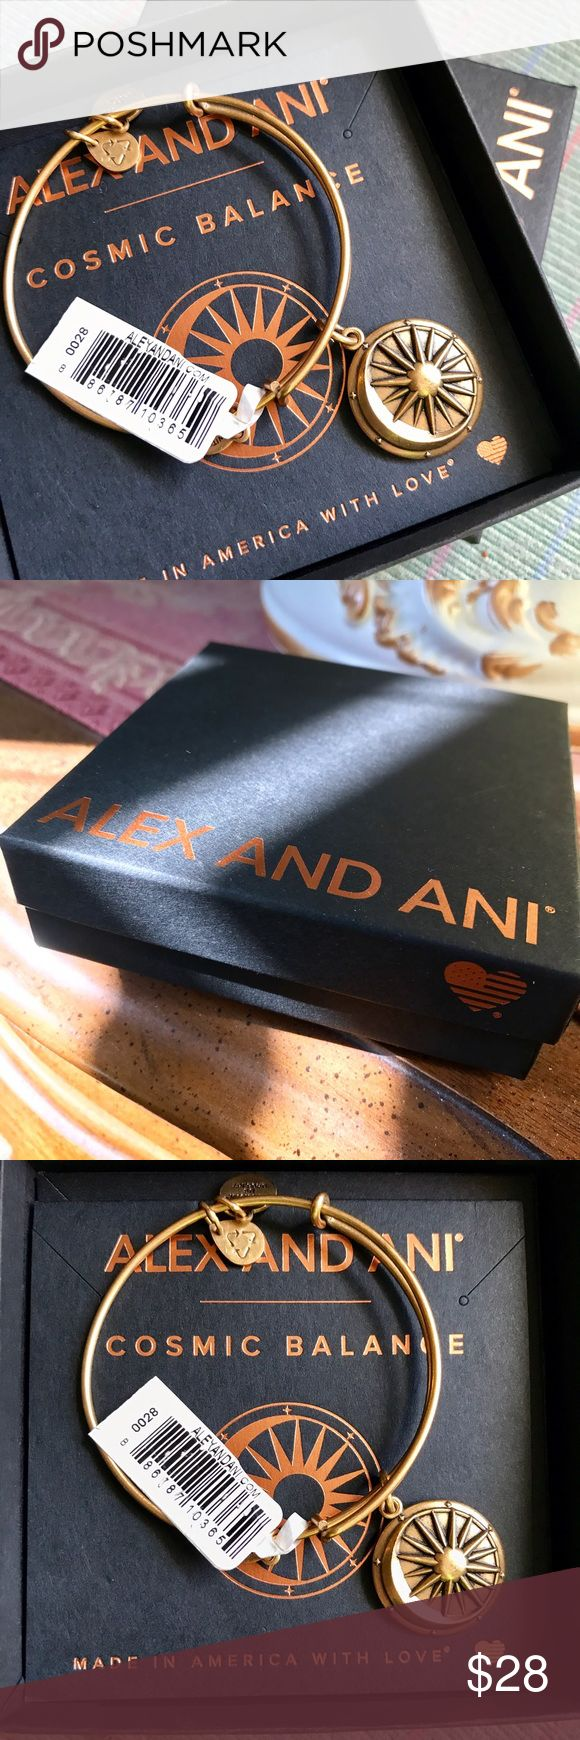 "NWT NIB Alex & Ani Cosmic Balance bangle Bracelet Rafaelian gold finish. Brand new in box with tags! Adjustable; 3/8"" - 7/8"" charm diameter. OBO. Box included! Alex & Ani Jewelry Bracelets"